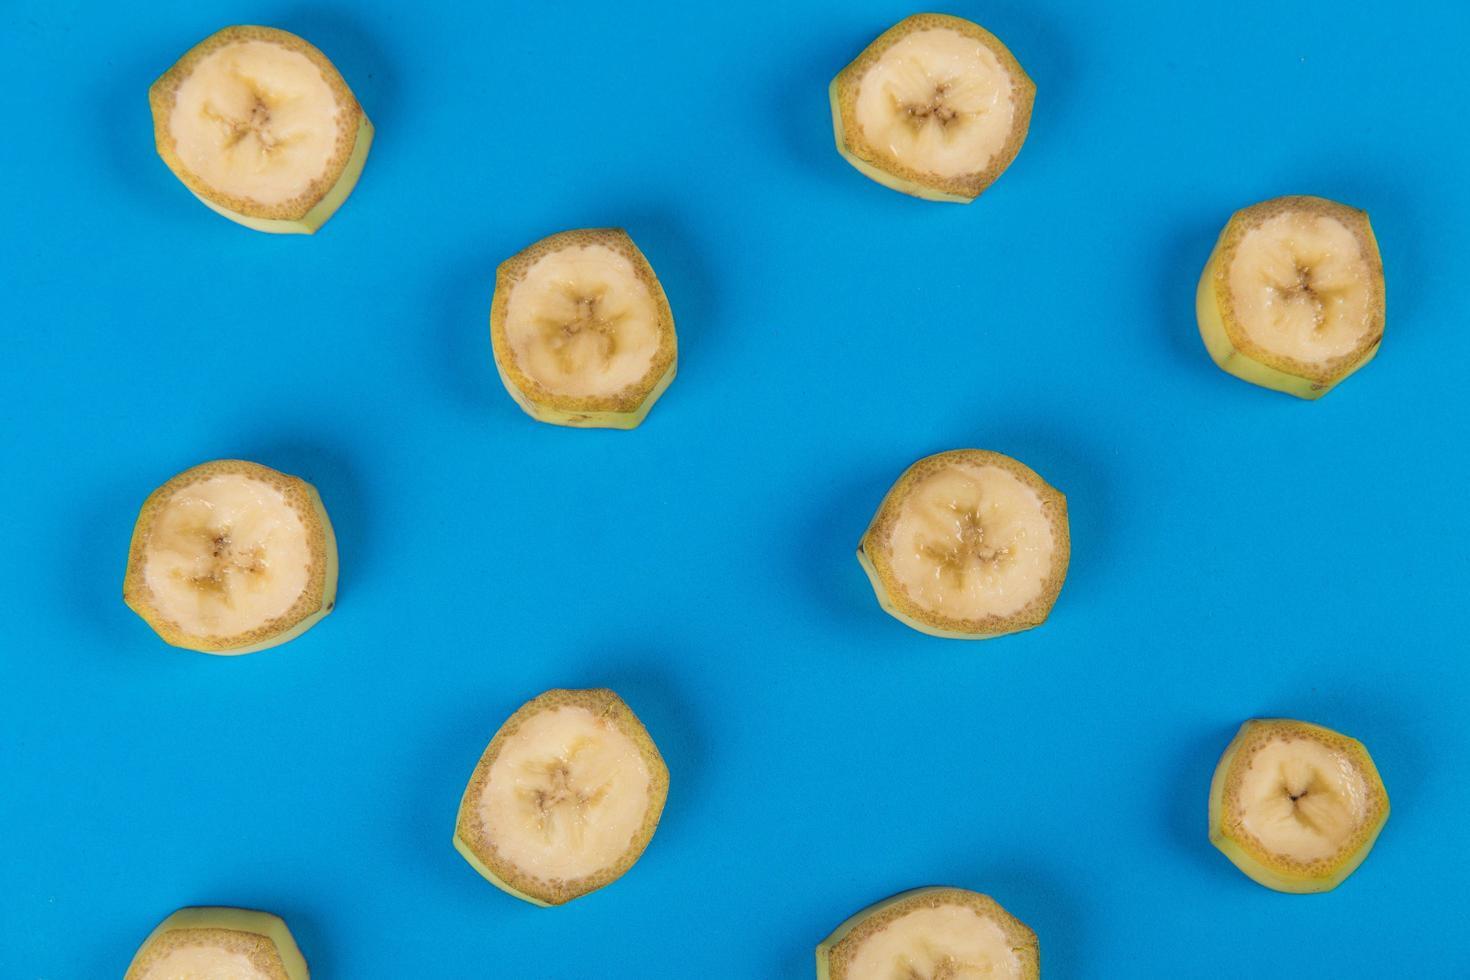 Unpeeled banana slices on blue background photo